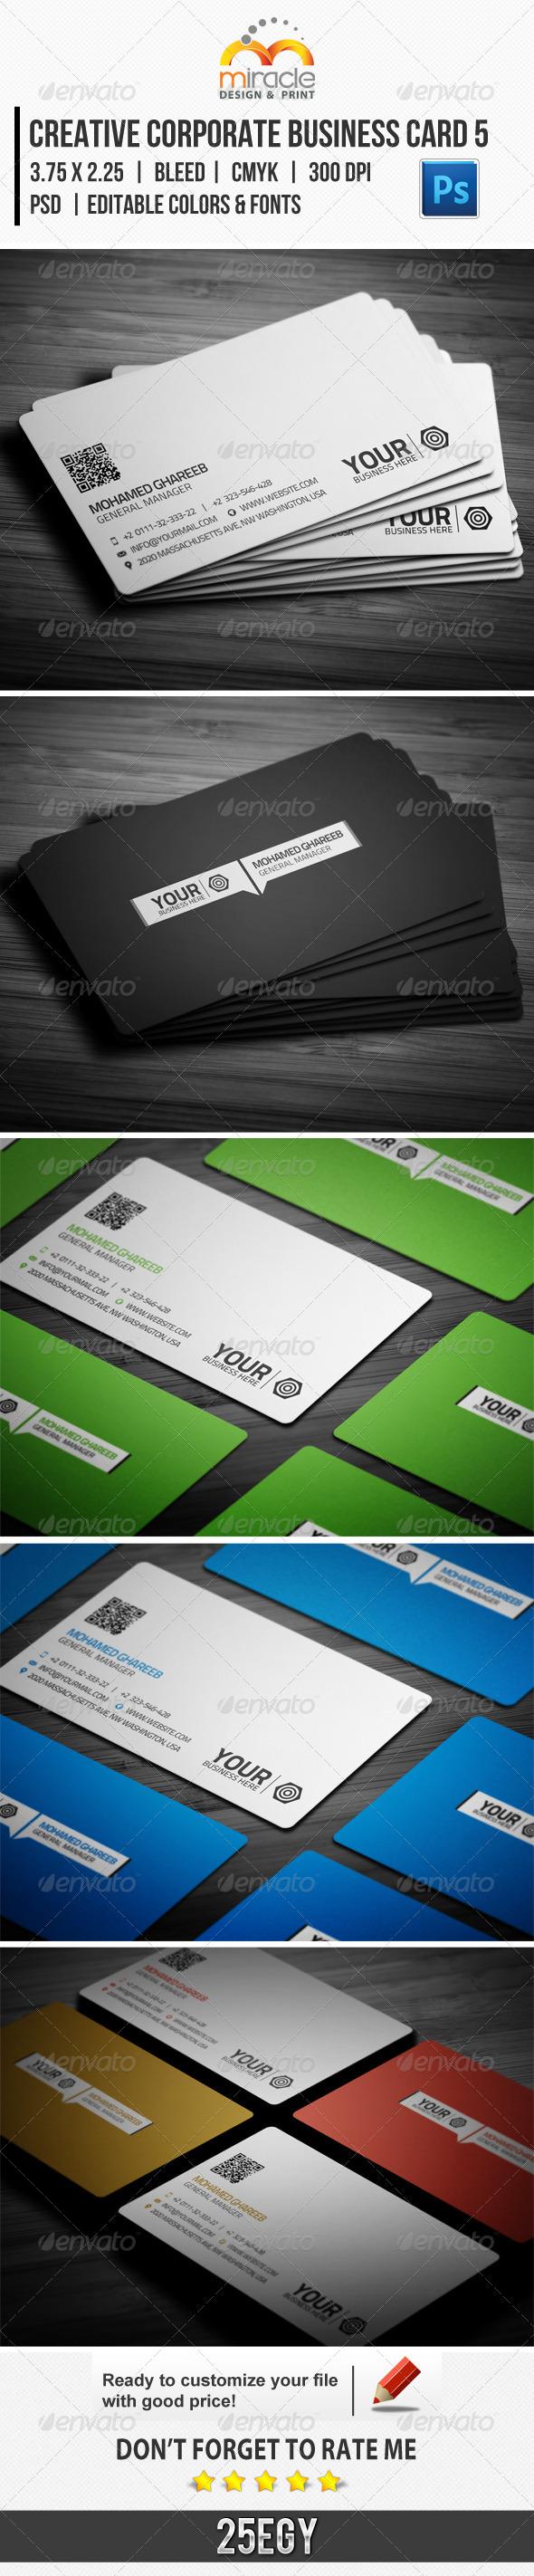 Creative Corporate Business Card 5 - Corporate Business Cards